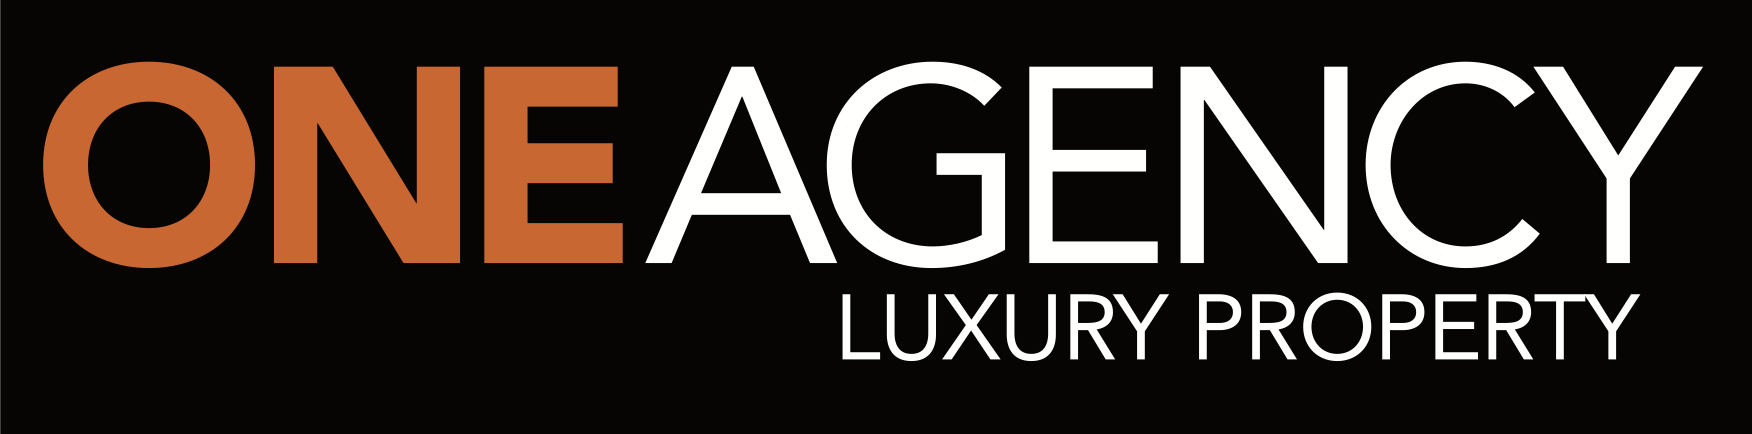 https://assets.boxdice.com.au/one-agency/attachments/f69/02b/one_agency_simple_logo2.png?f2640dad6464eb25b390bf4b02e5b261